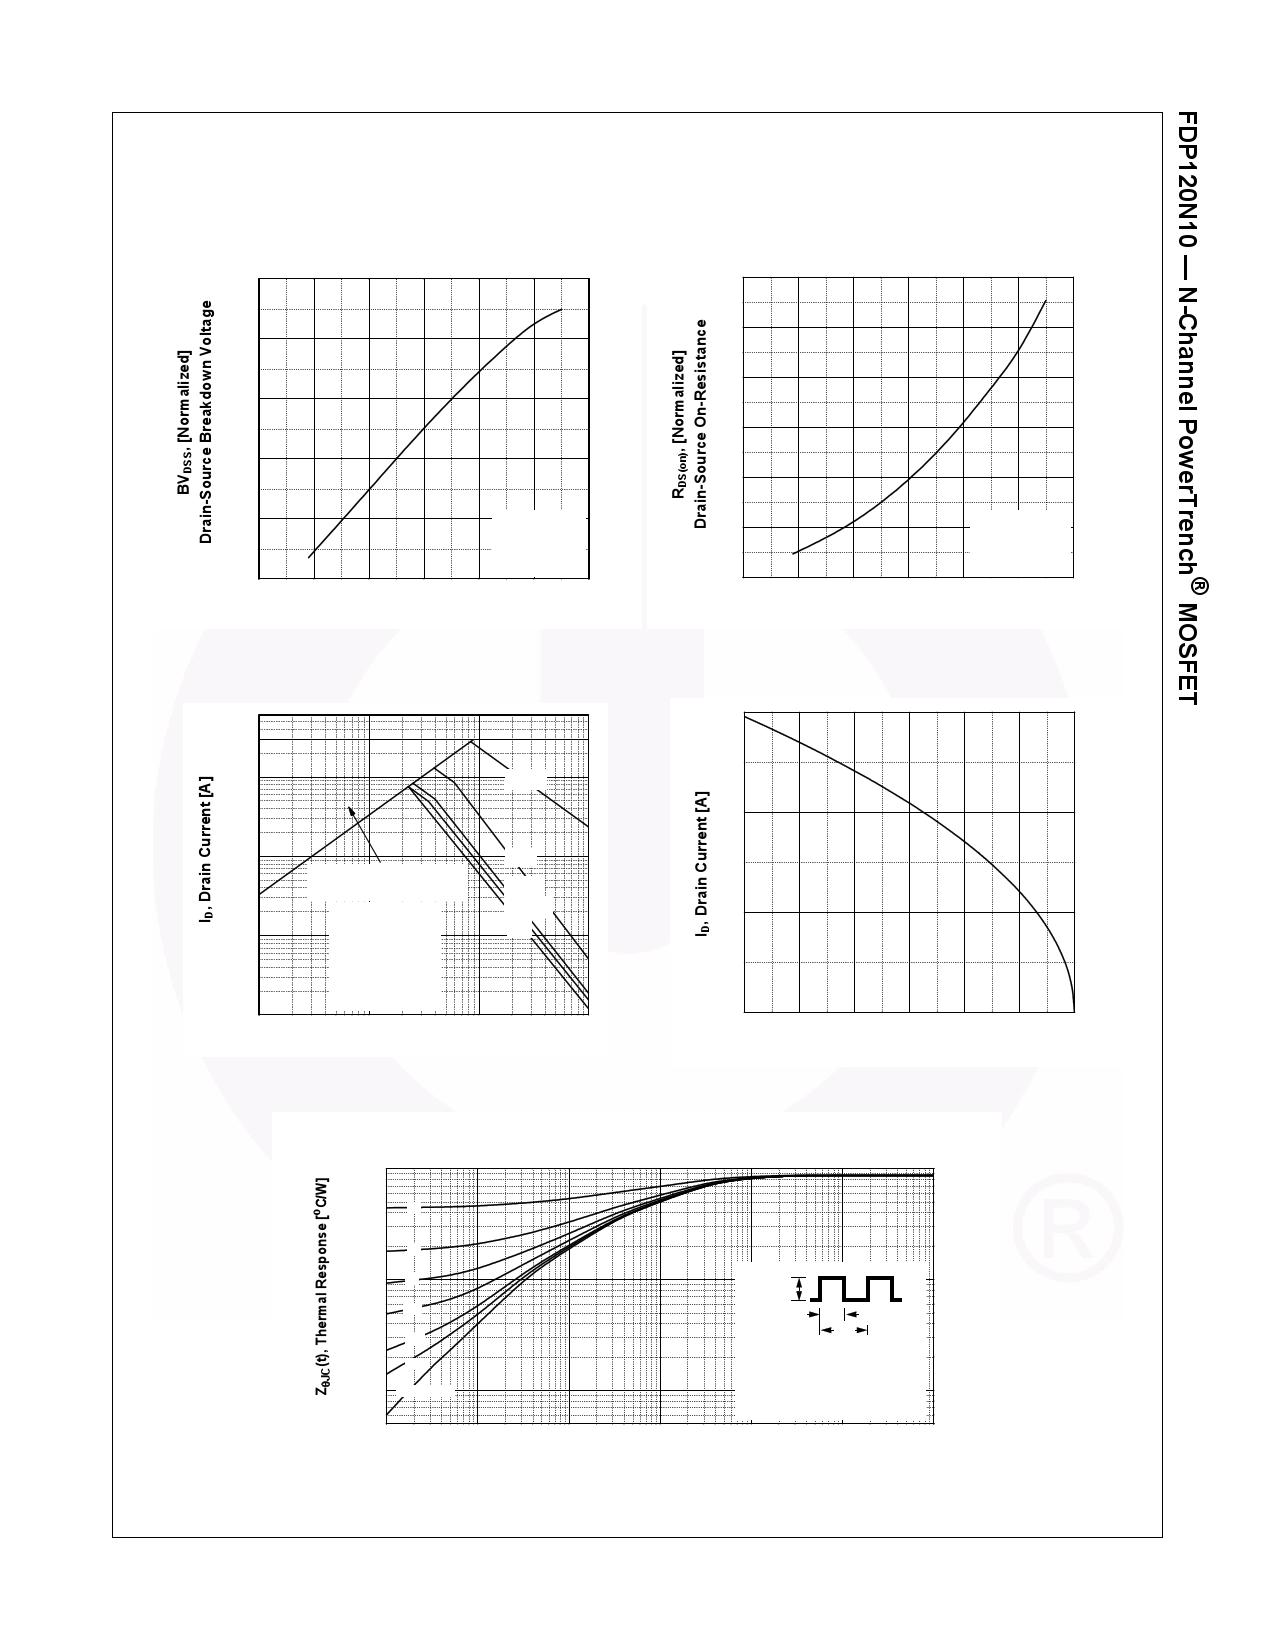 FDP120N10 pdf, 반도체, 판매, 대치품